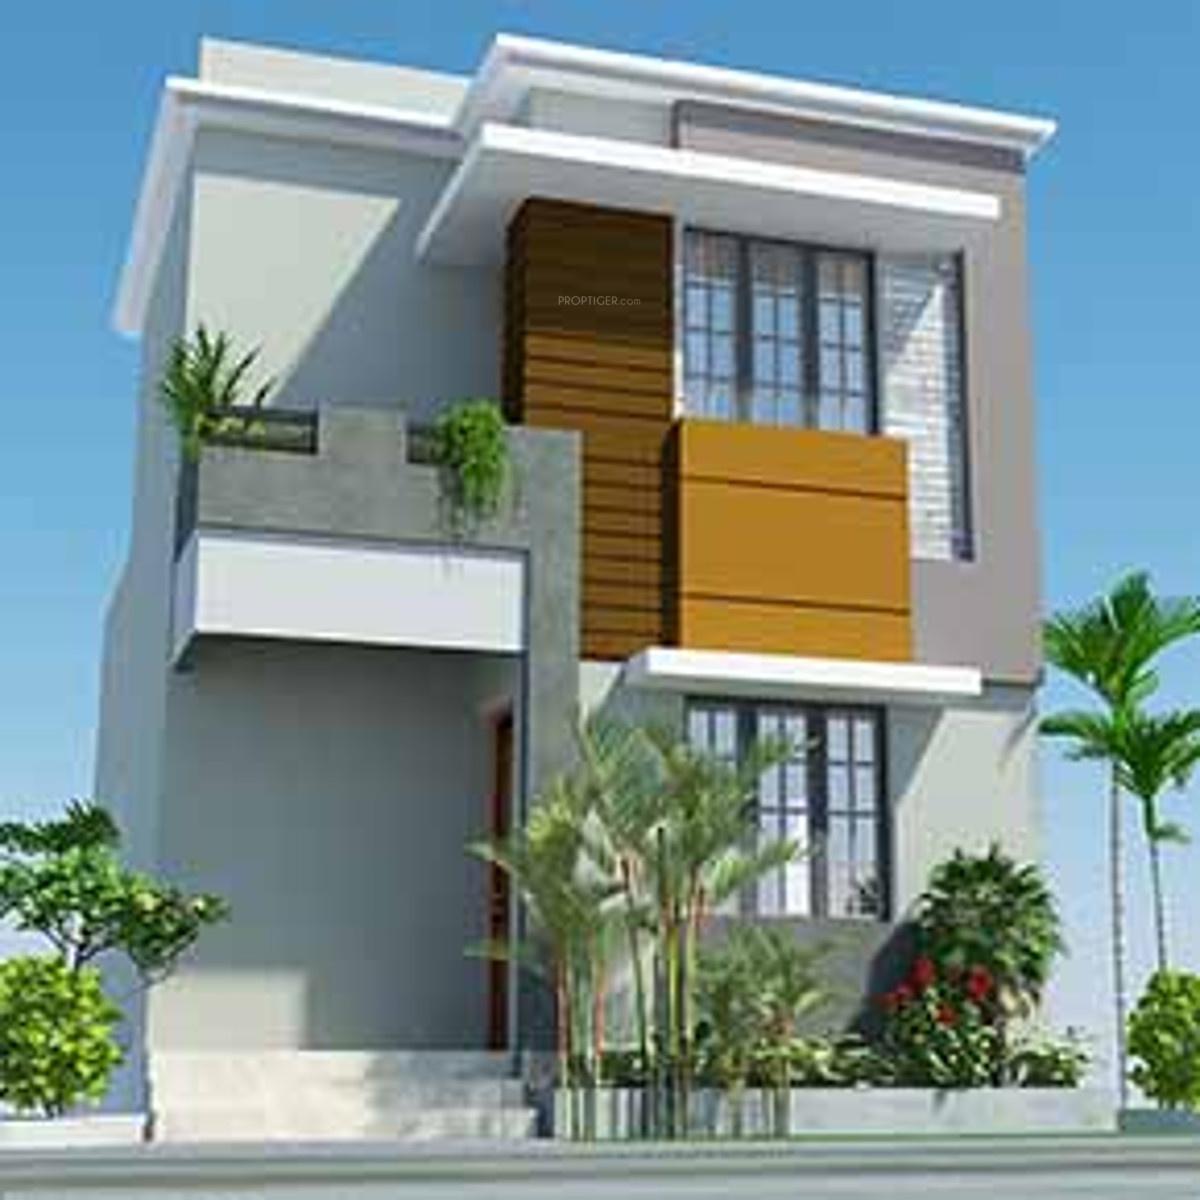 Property for Sale in Oragadam: PropTiger com